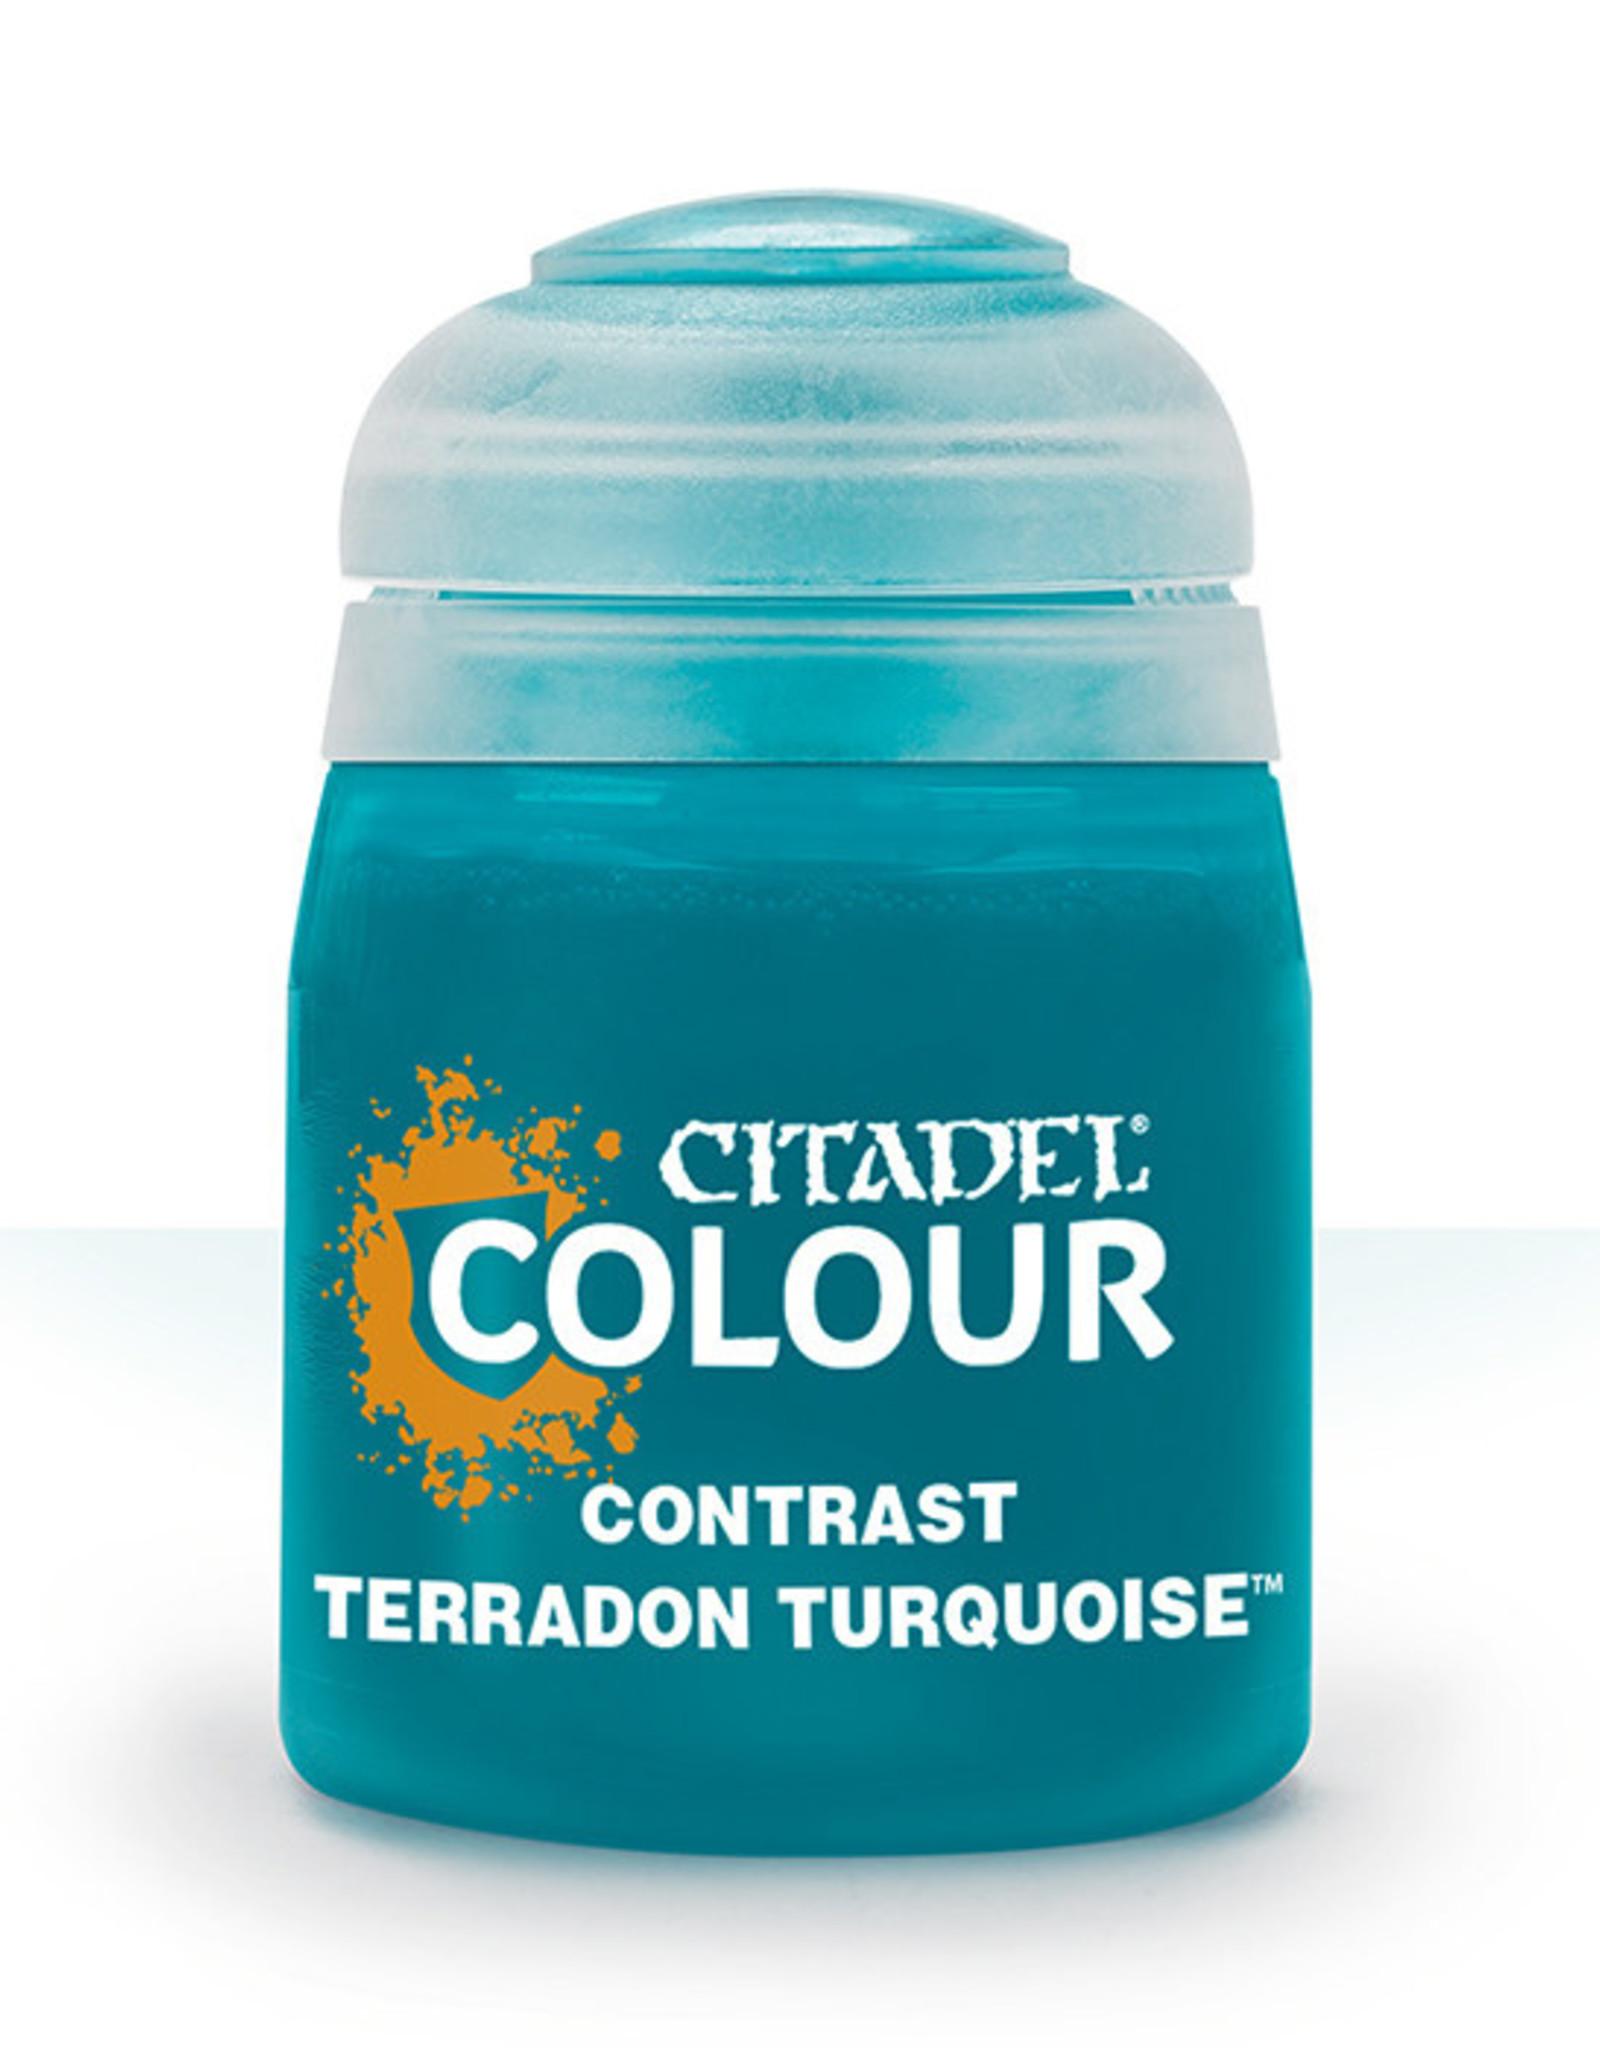 Citadel Citadel Colour: Contrast - Terradon Turquoise